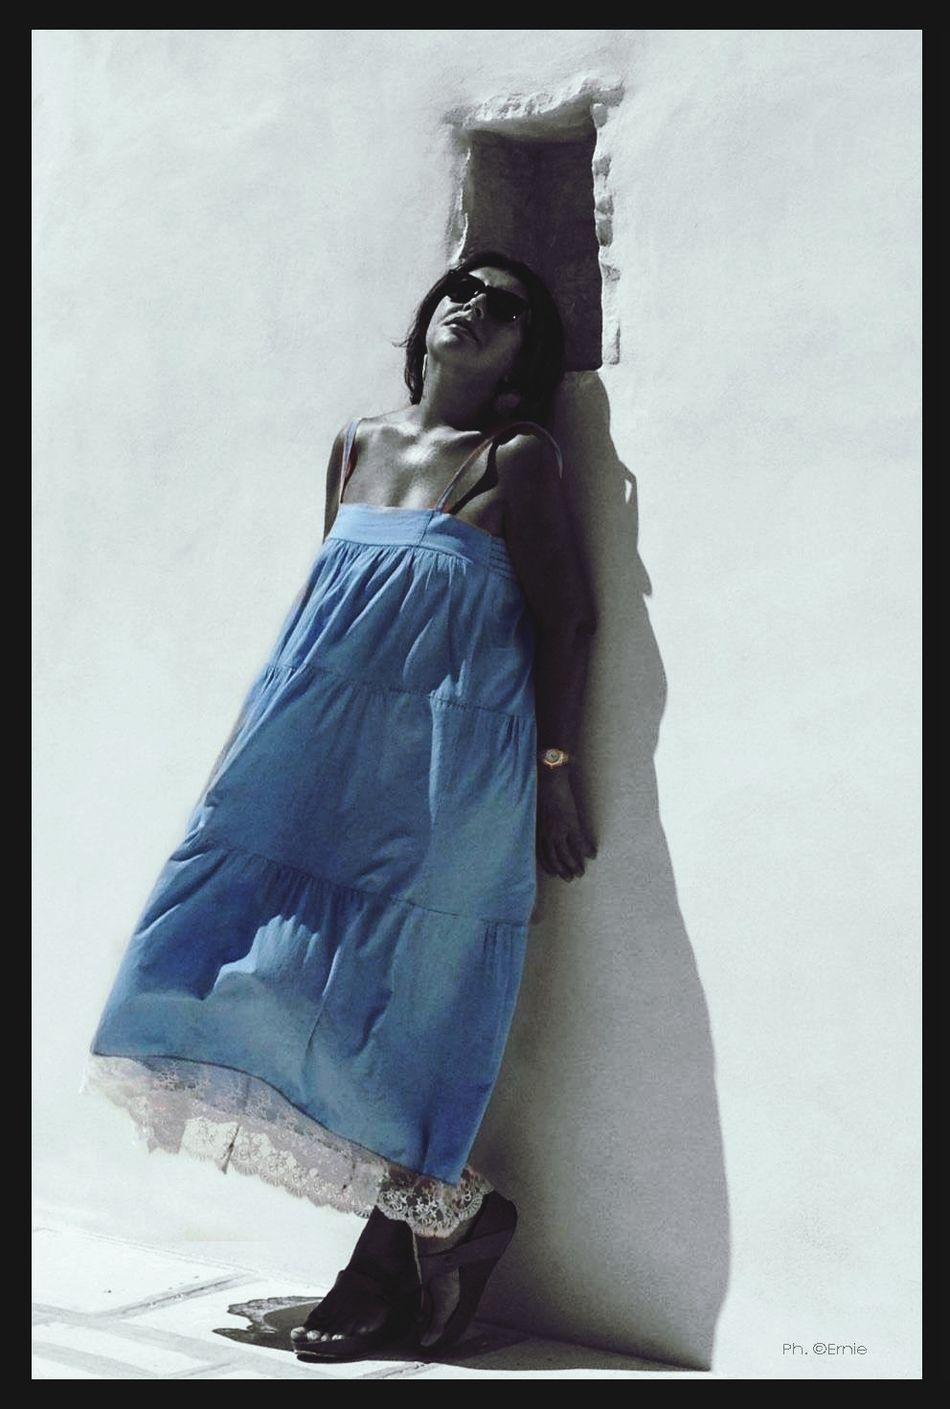 Cisternino Friend Woman Who Inspire You Black And White Colors White Wall Ernesto Galizia Window Fashion Fashion&love&beauty Beautiful Woman Lifestyles